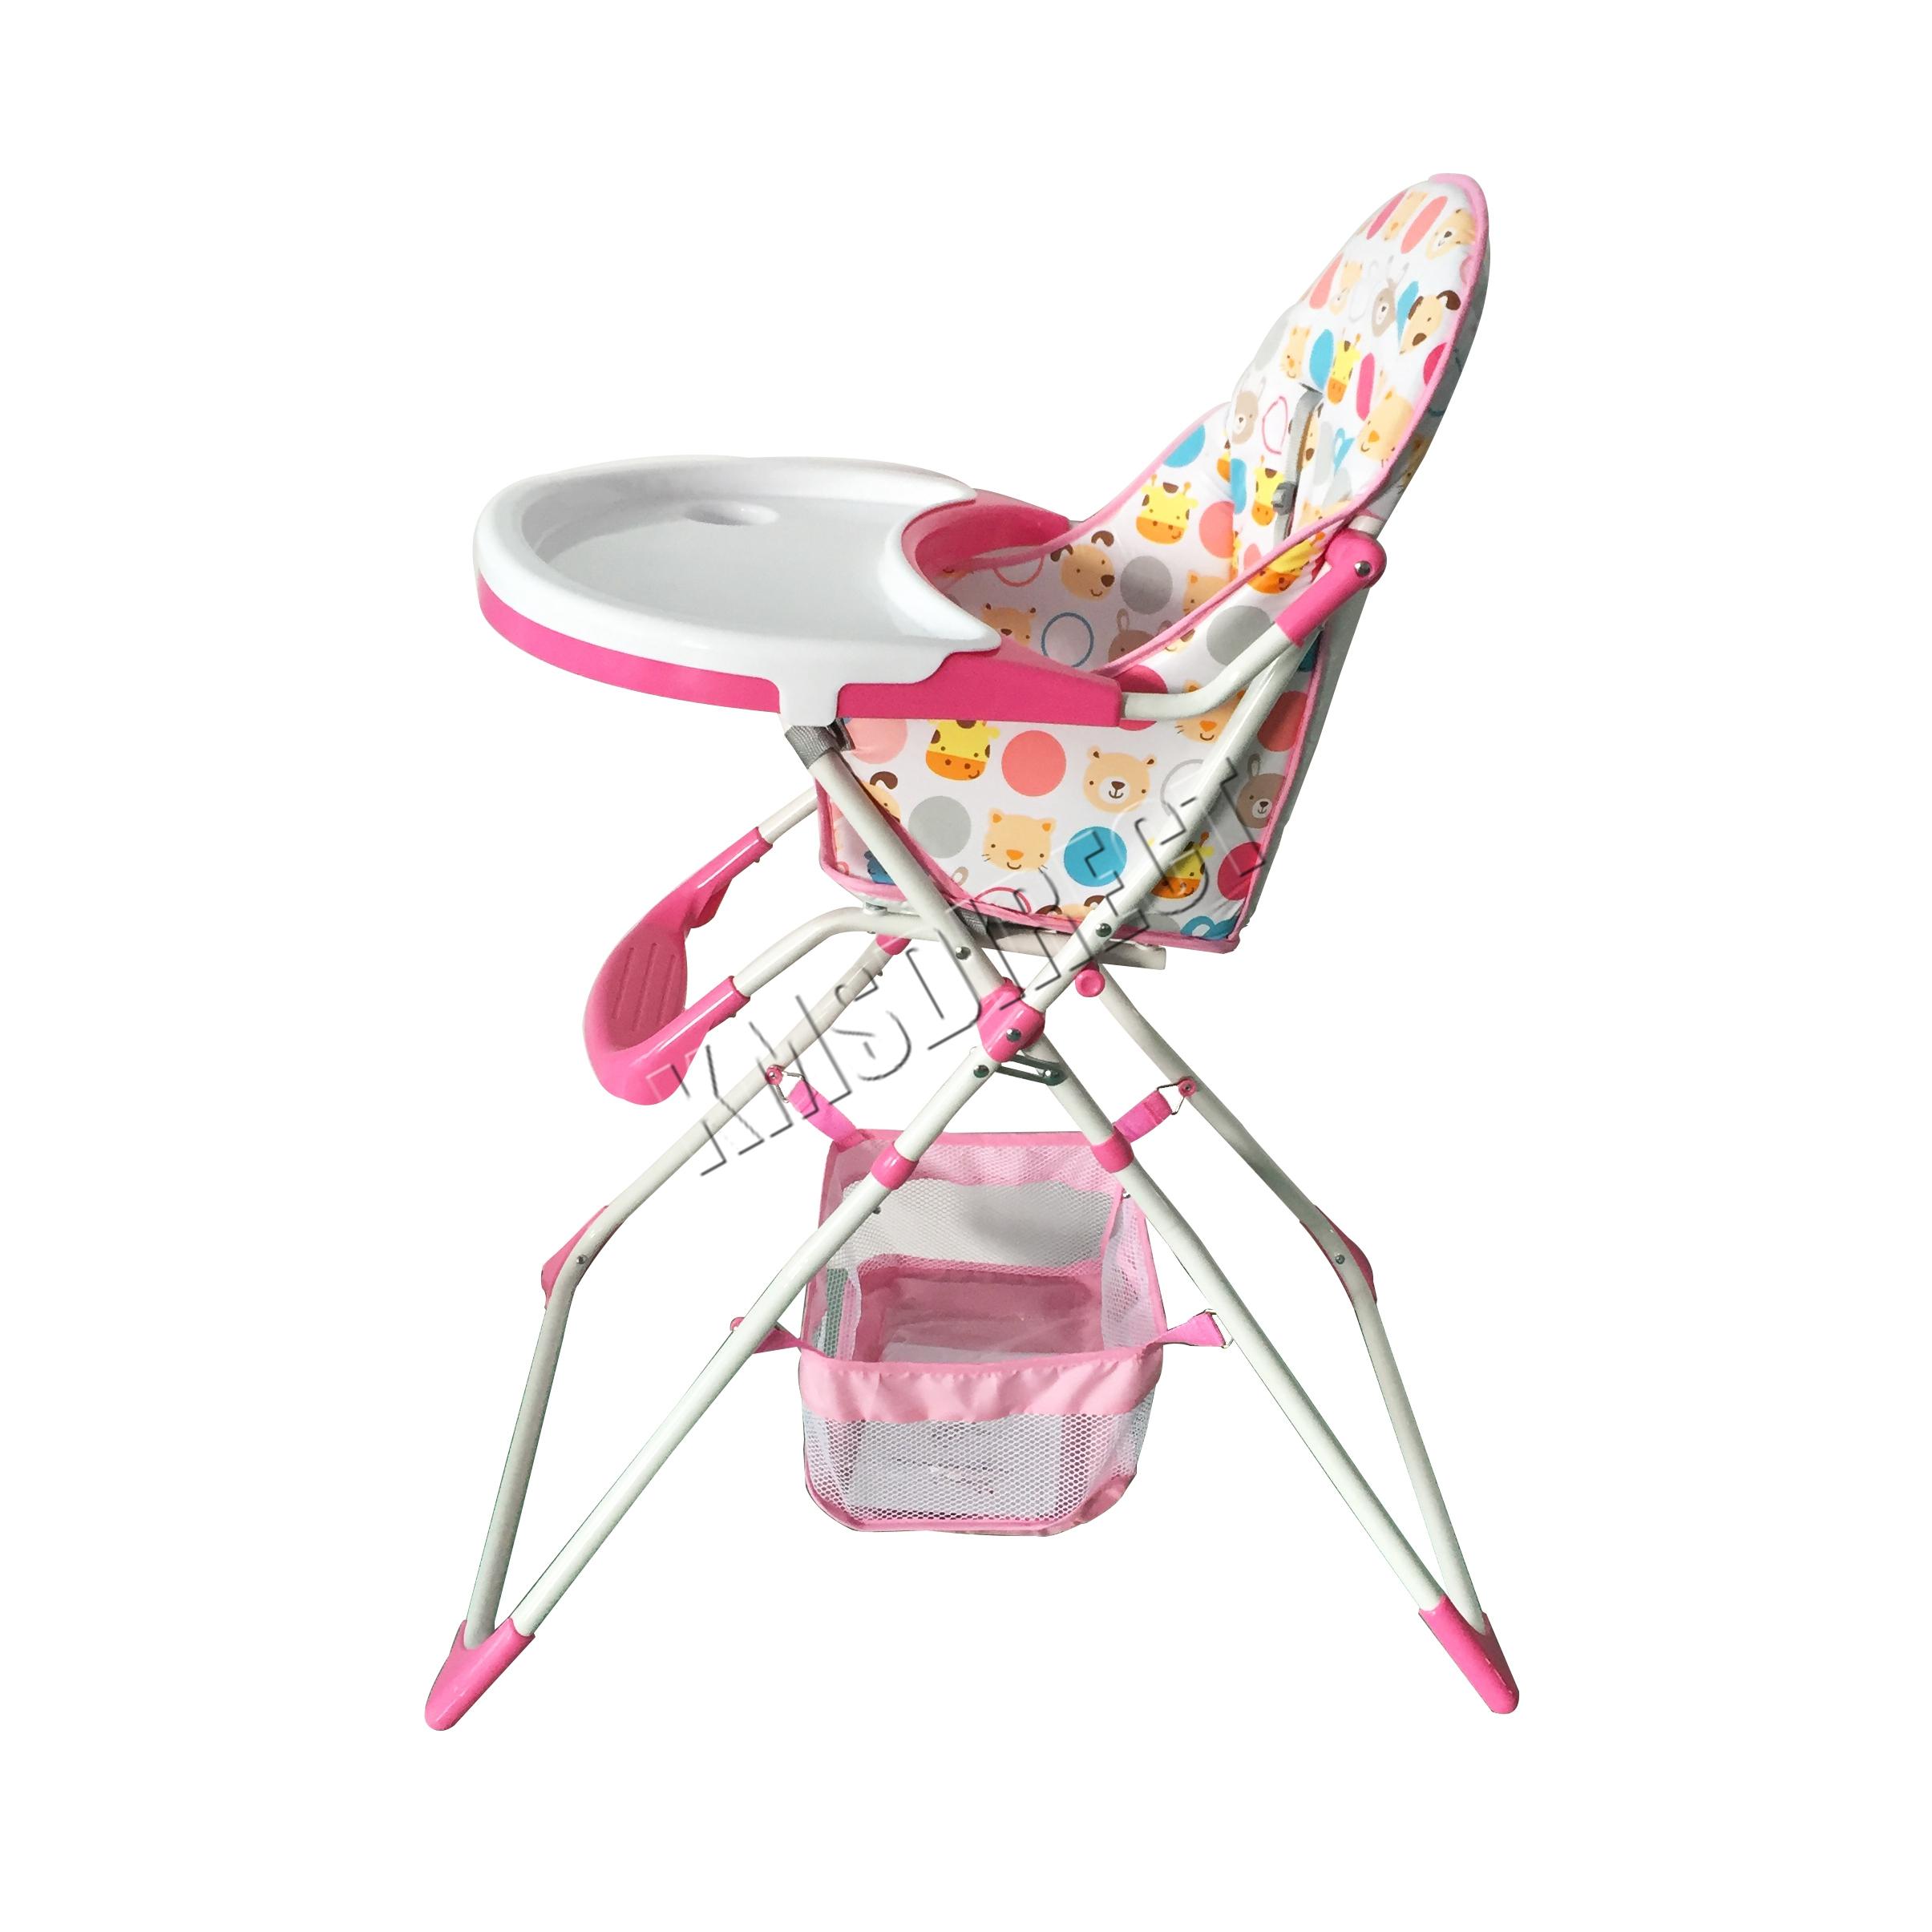 FoxHunter Portable Baby High Chair Infant Child Folding Feeding